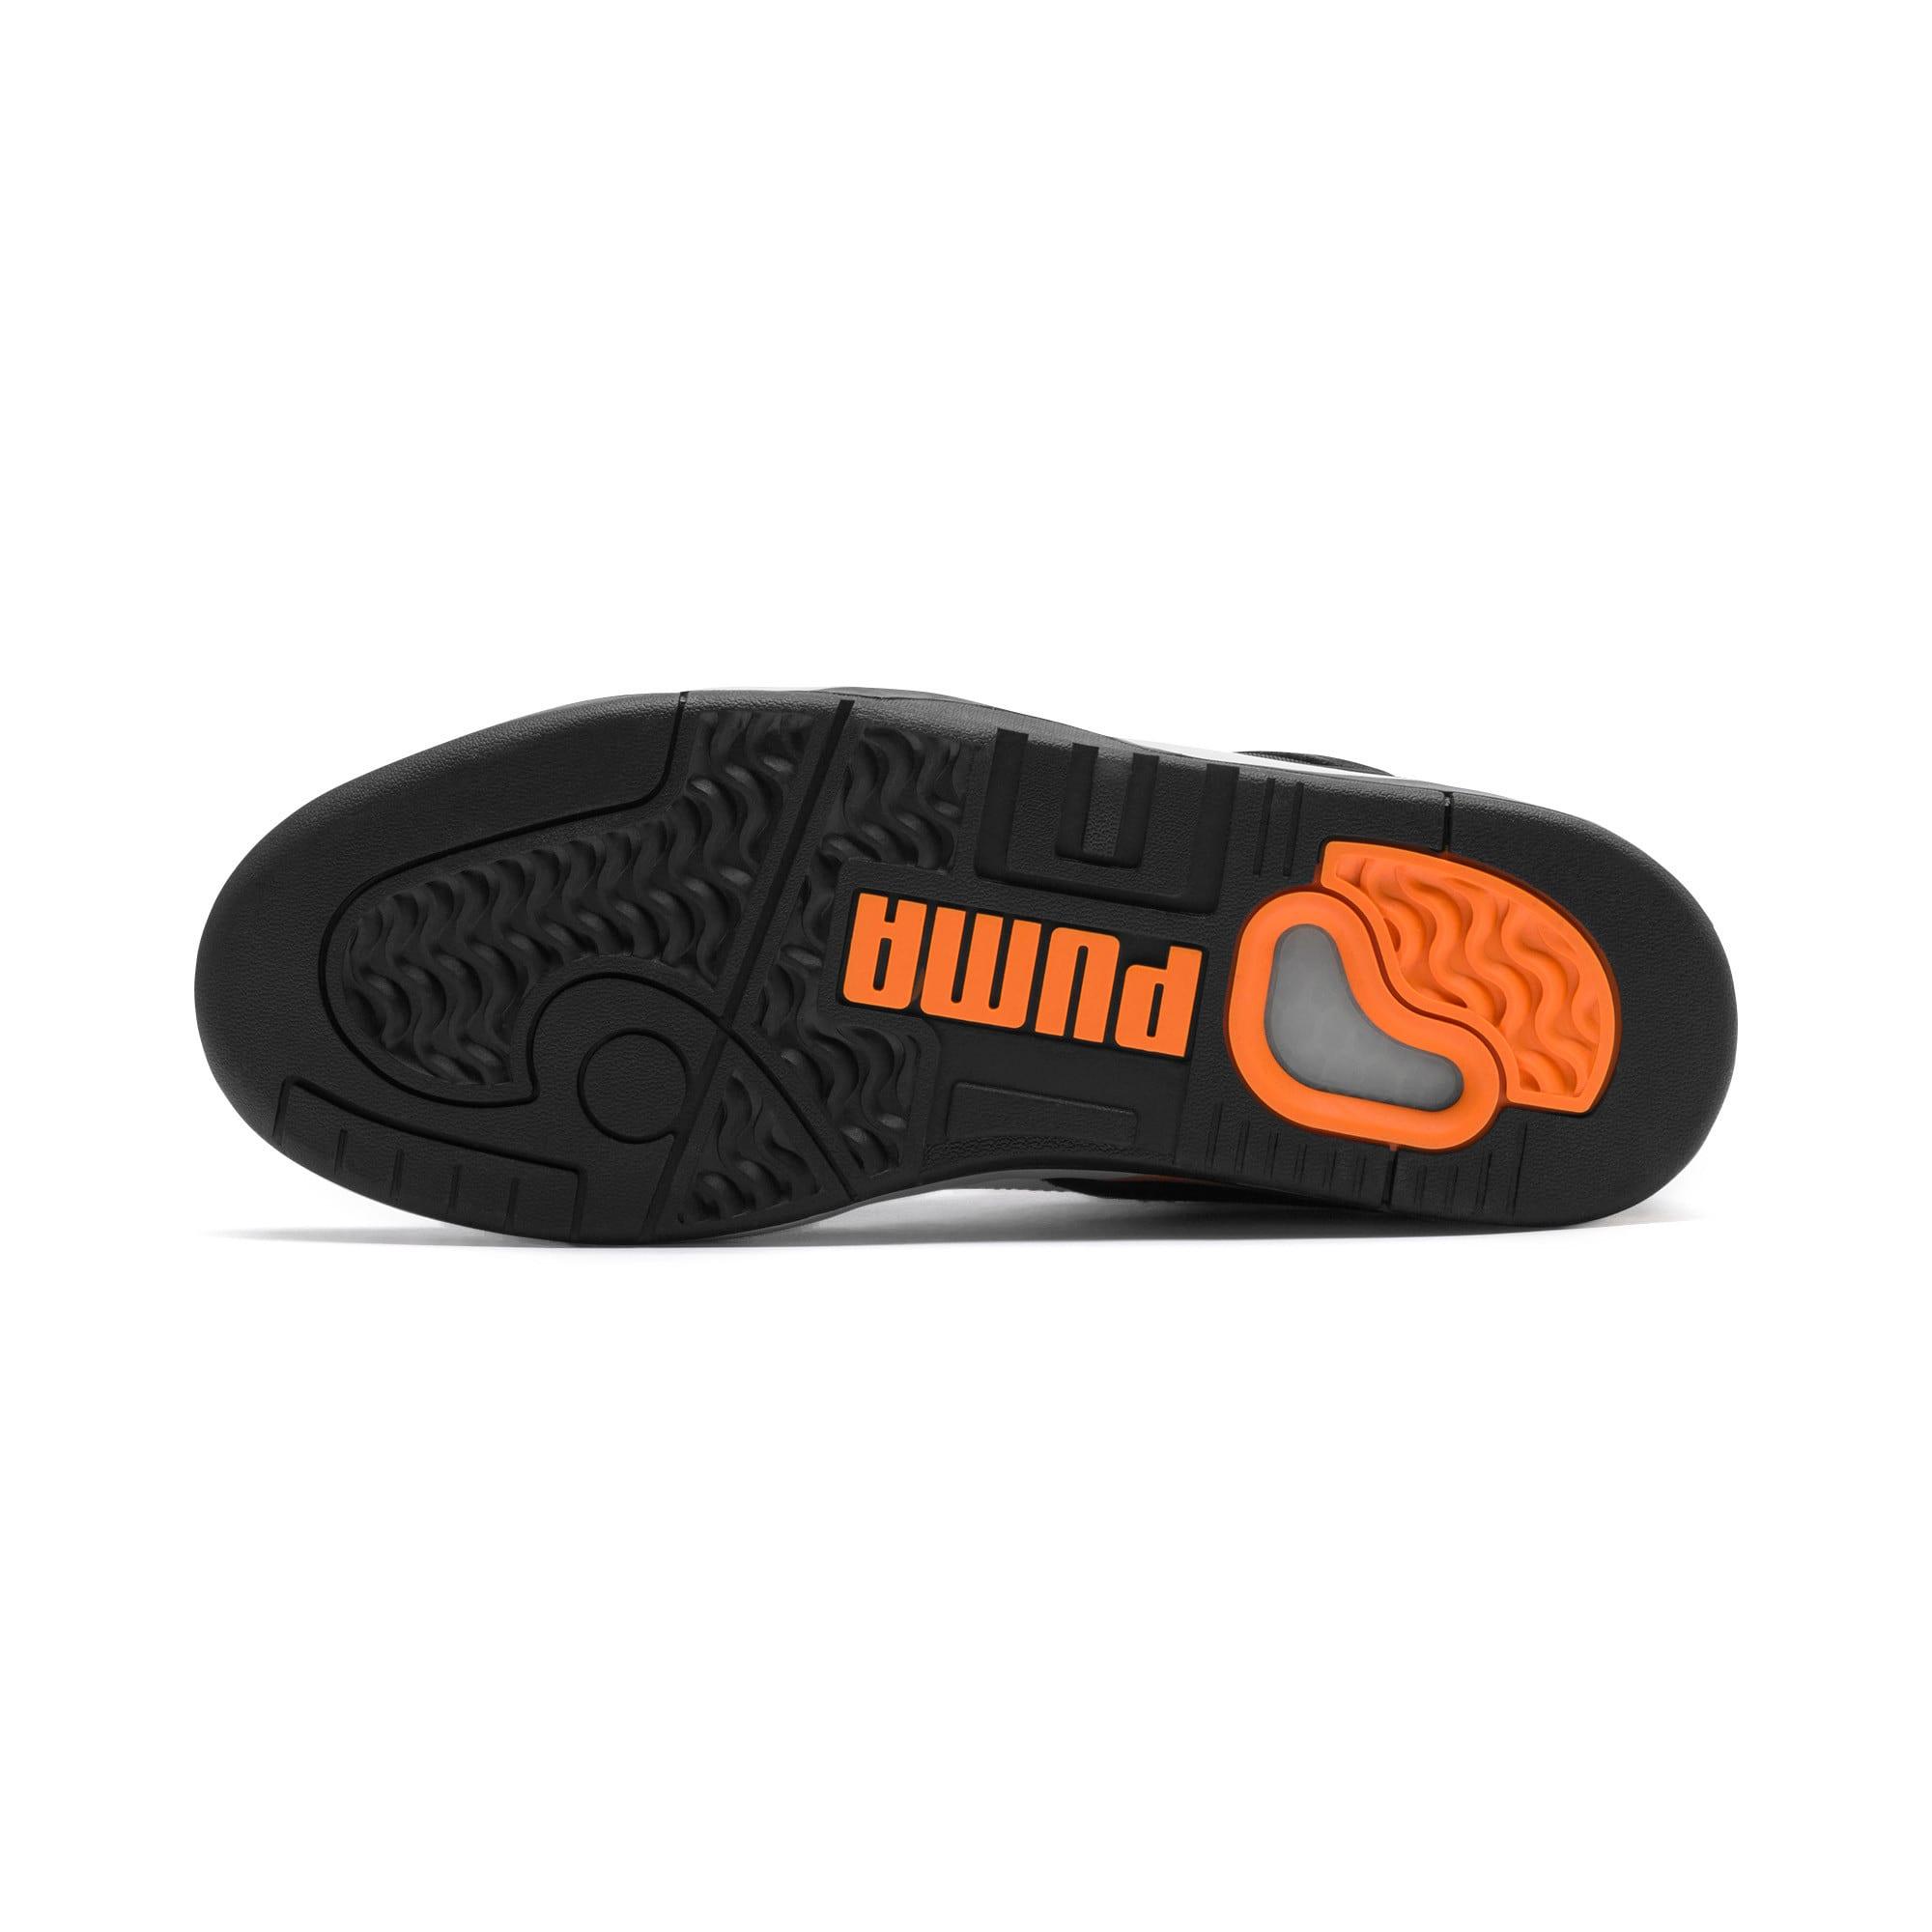 Thumbnail 4 of Palace Guard BB Sneakers, Puma Black-Puma White-, medium